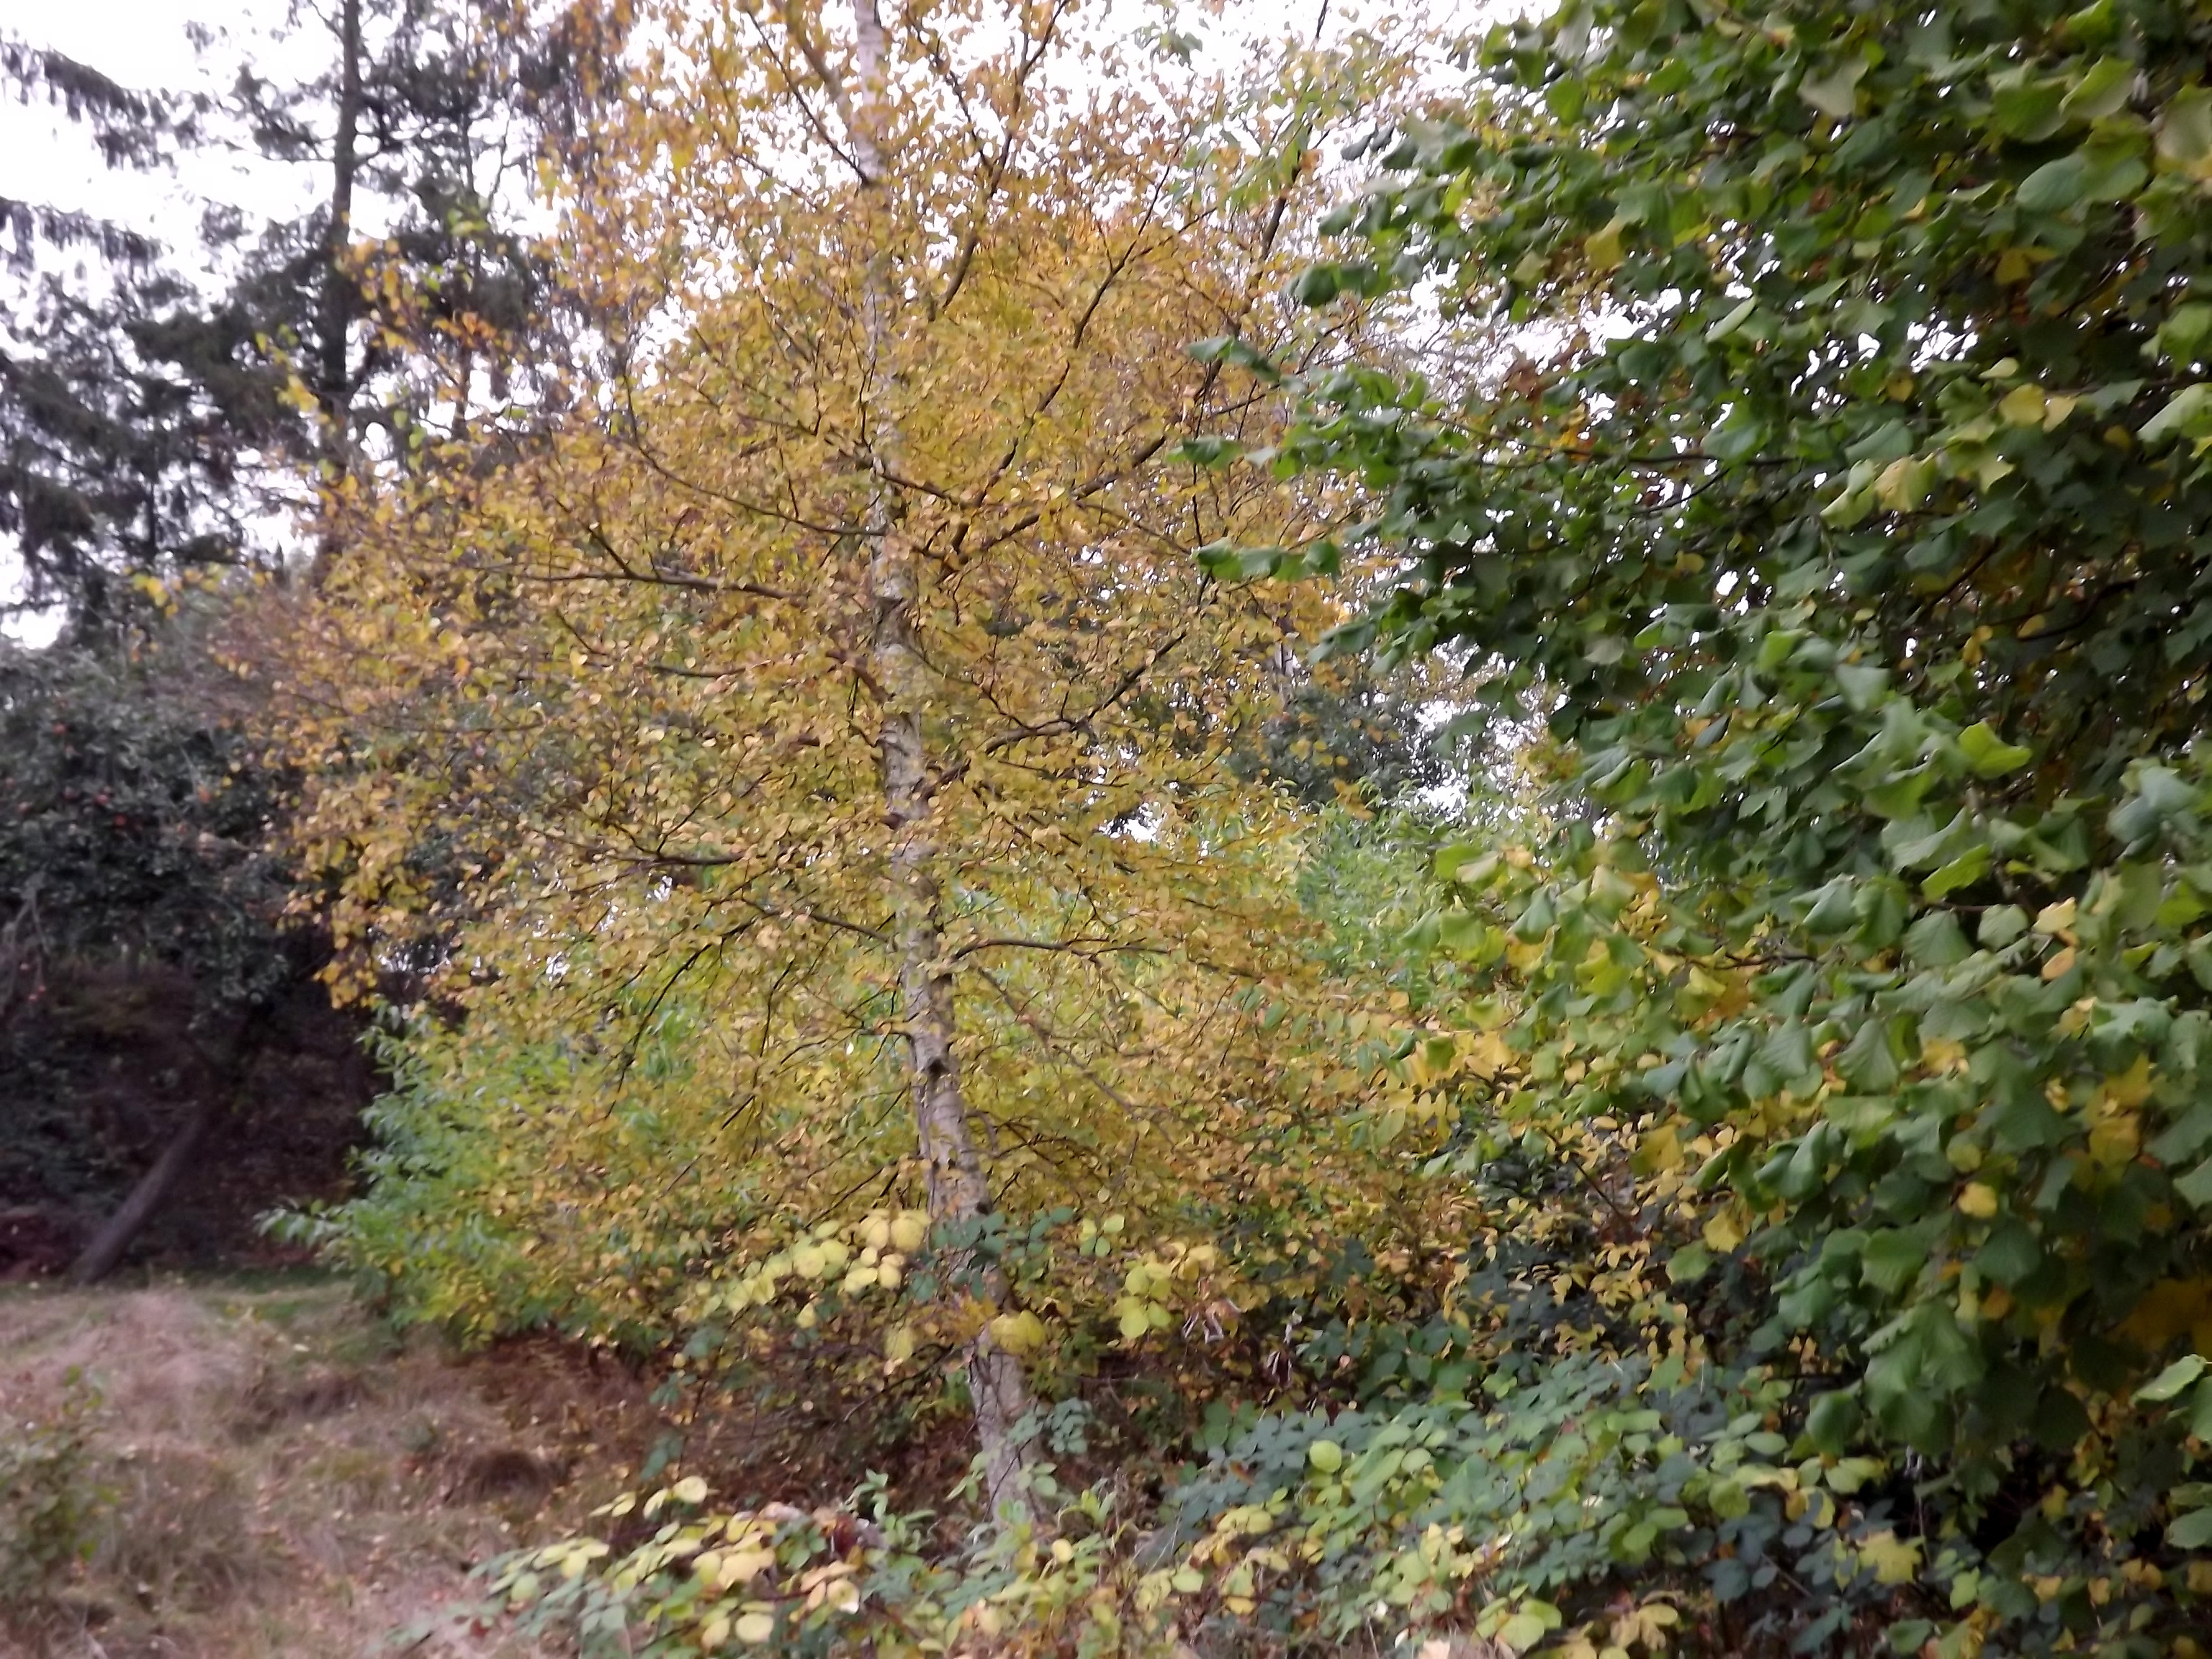 5546-herbst-wald